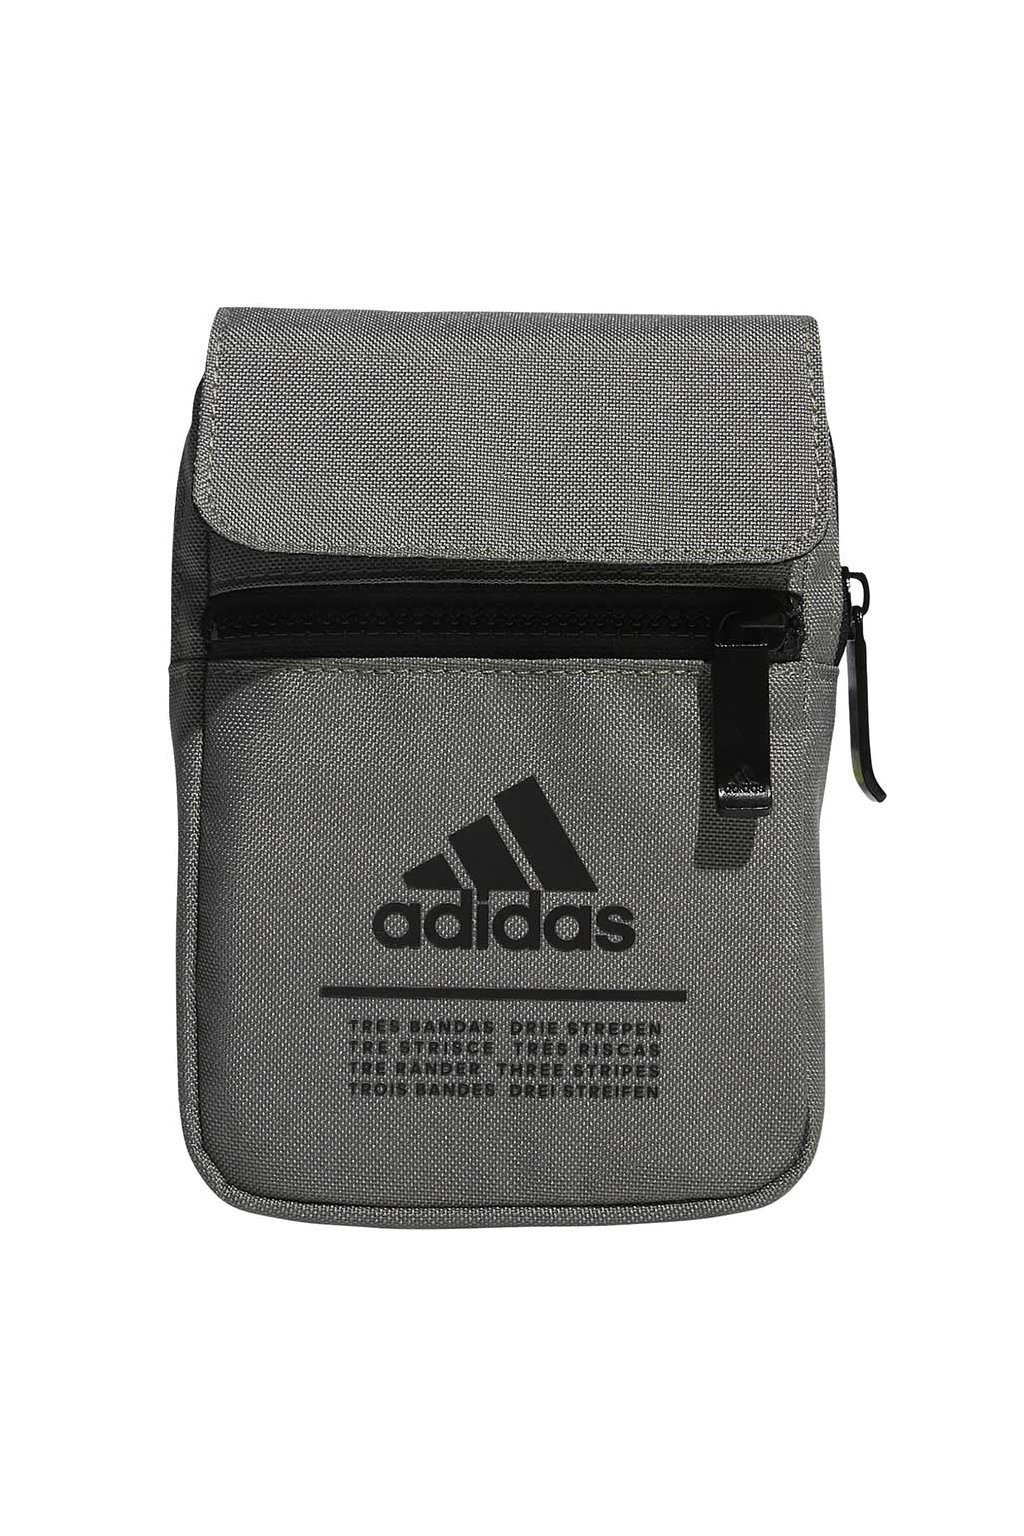 Taška adidas Classic Org S šedo-zelená GE4629